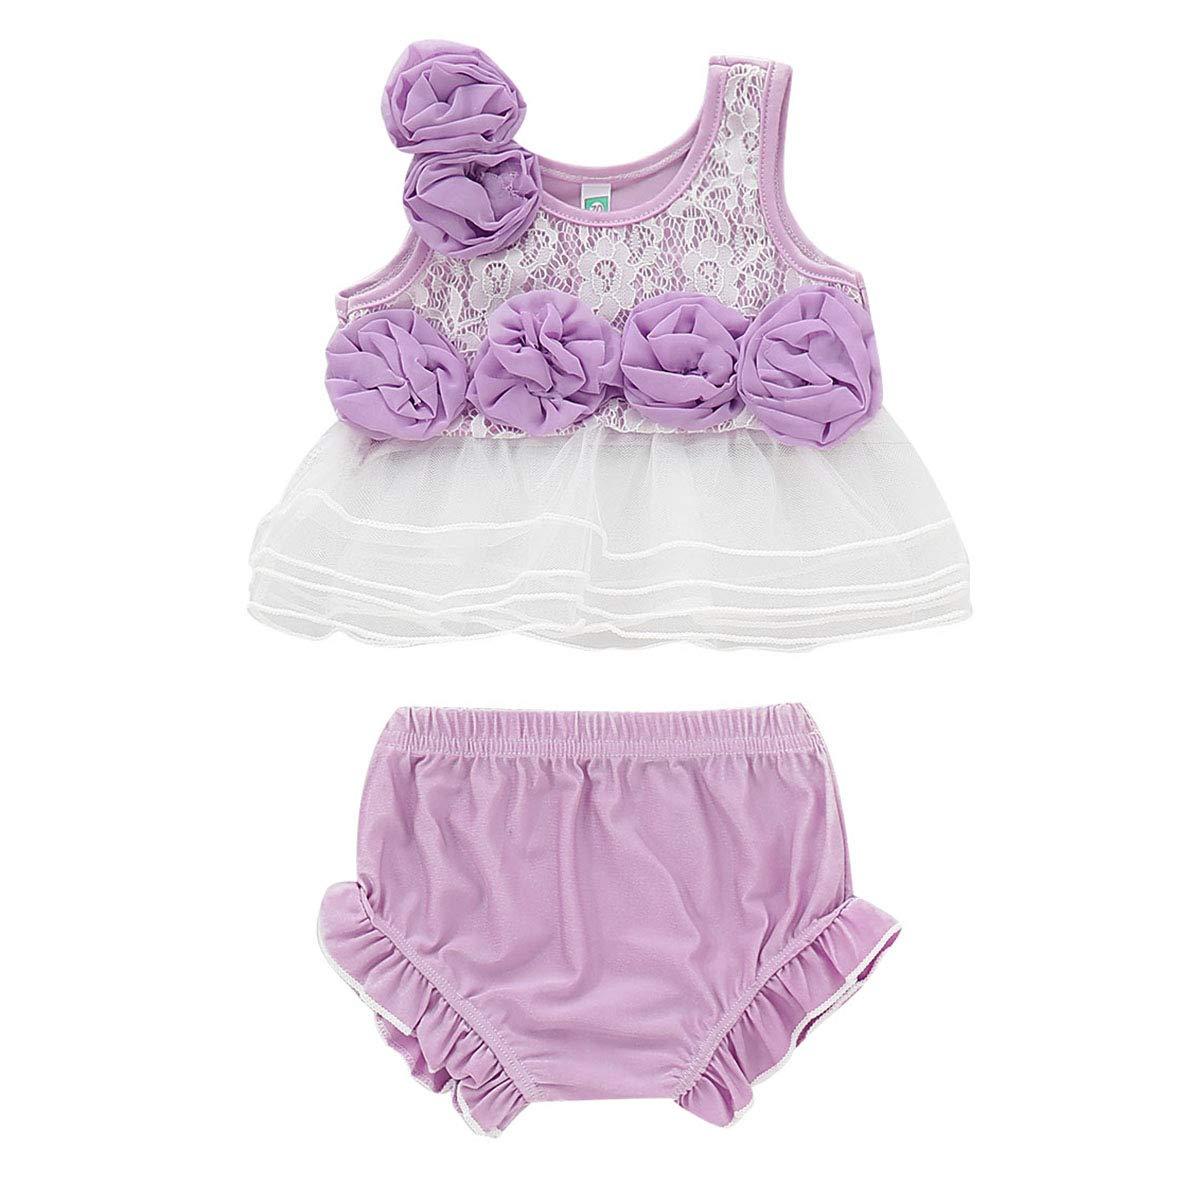 puseky 2PCS Baby Girls Sleeveless Floral Lace Shirt Dress Ruffle Shorts Pants Summer Outfits Set